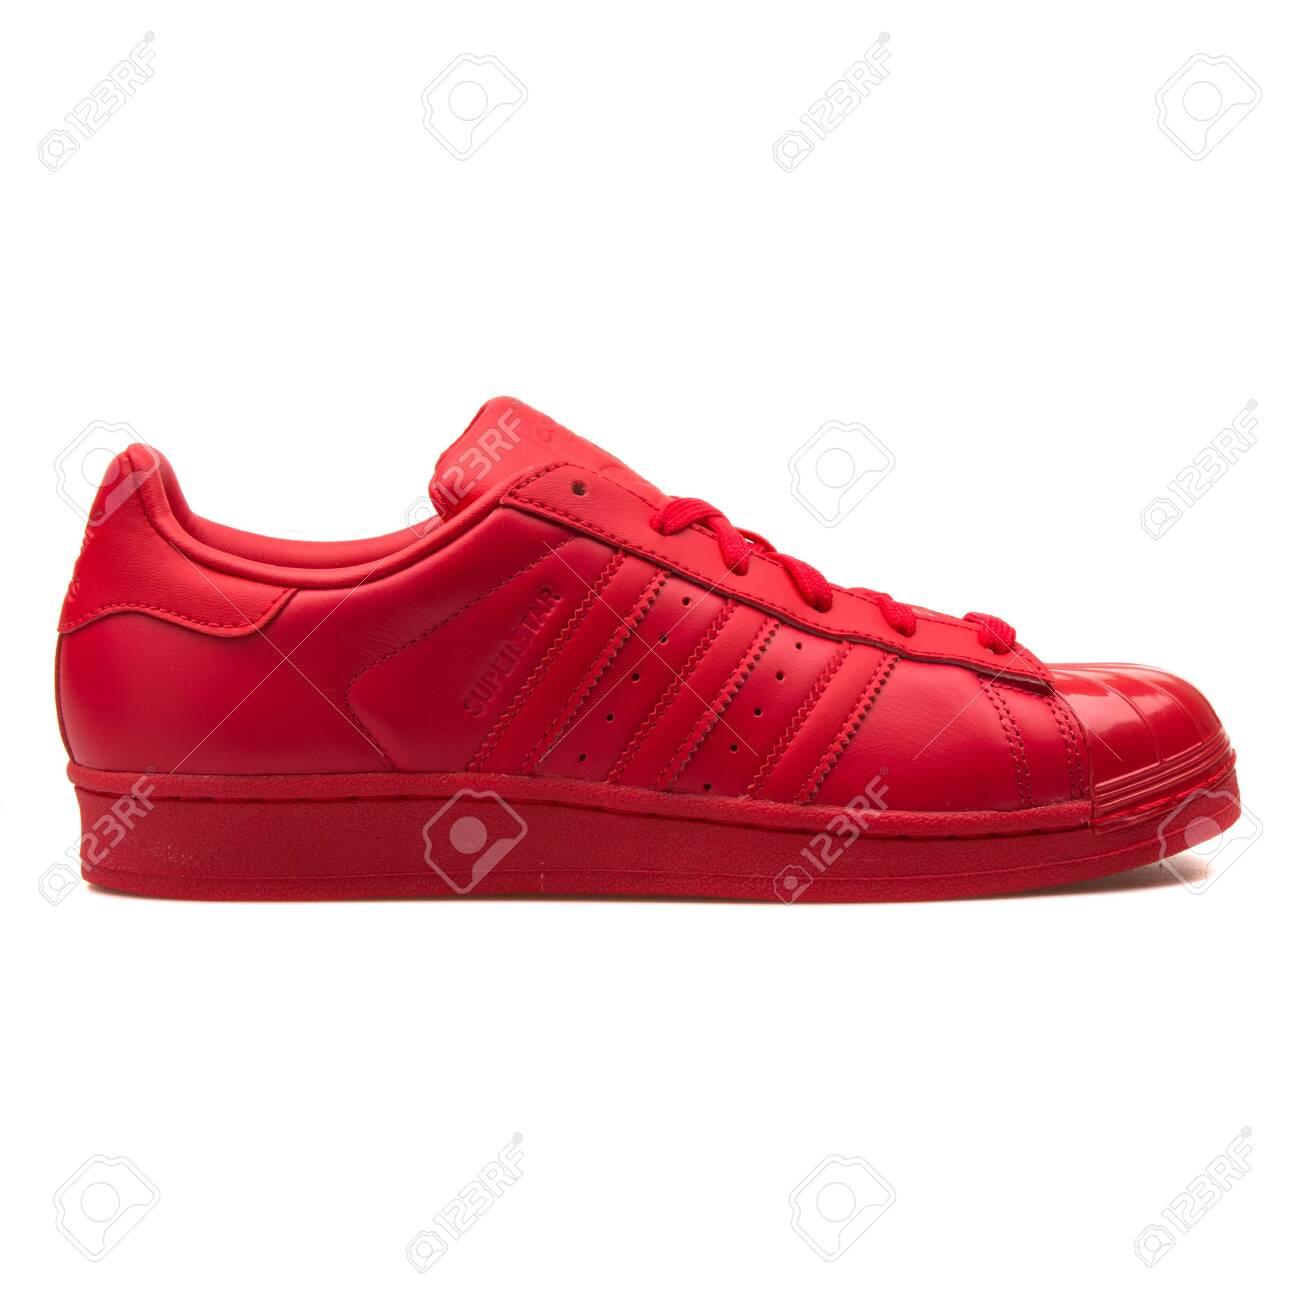 size 40 71ae5 16265 VIENNA, AUSTRIA - AUGUST 30, 2017: Adidas Superstar Glossy Toe..